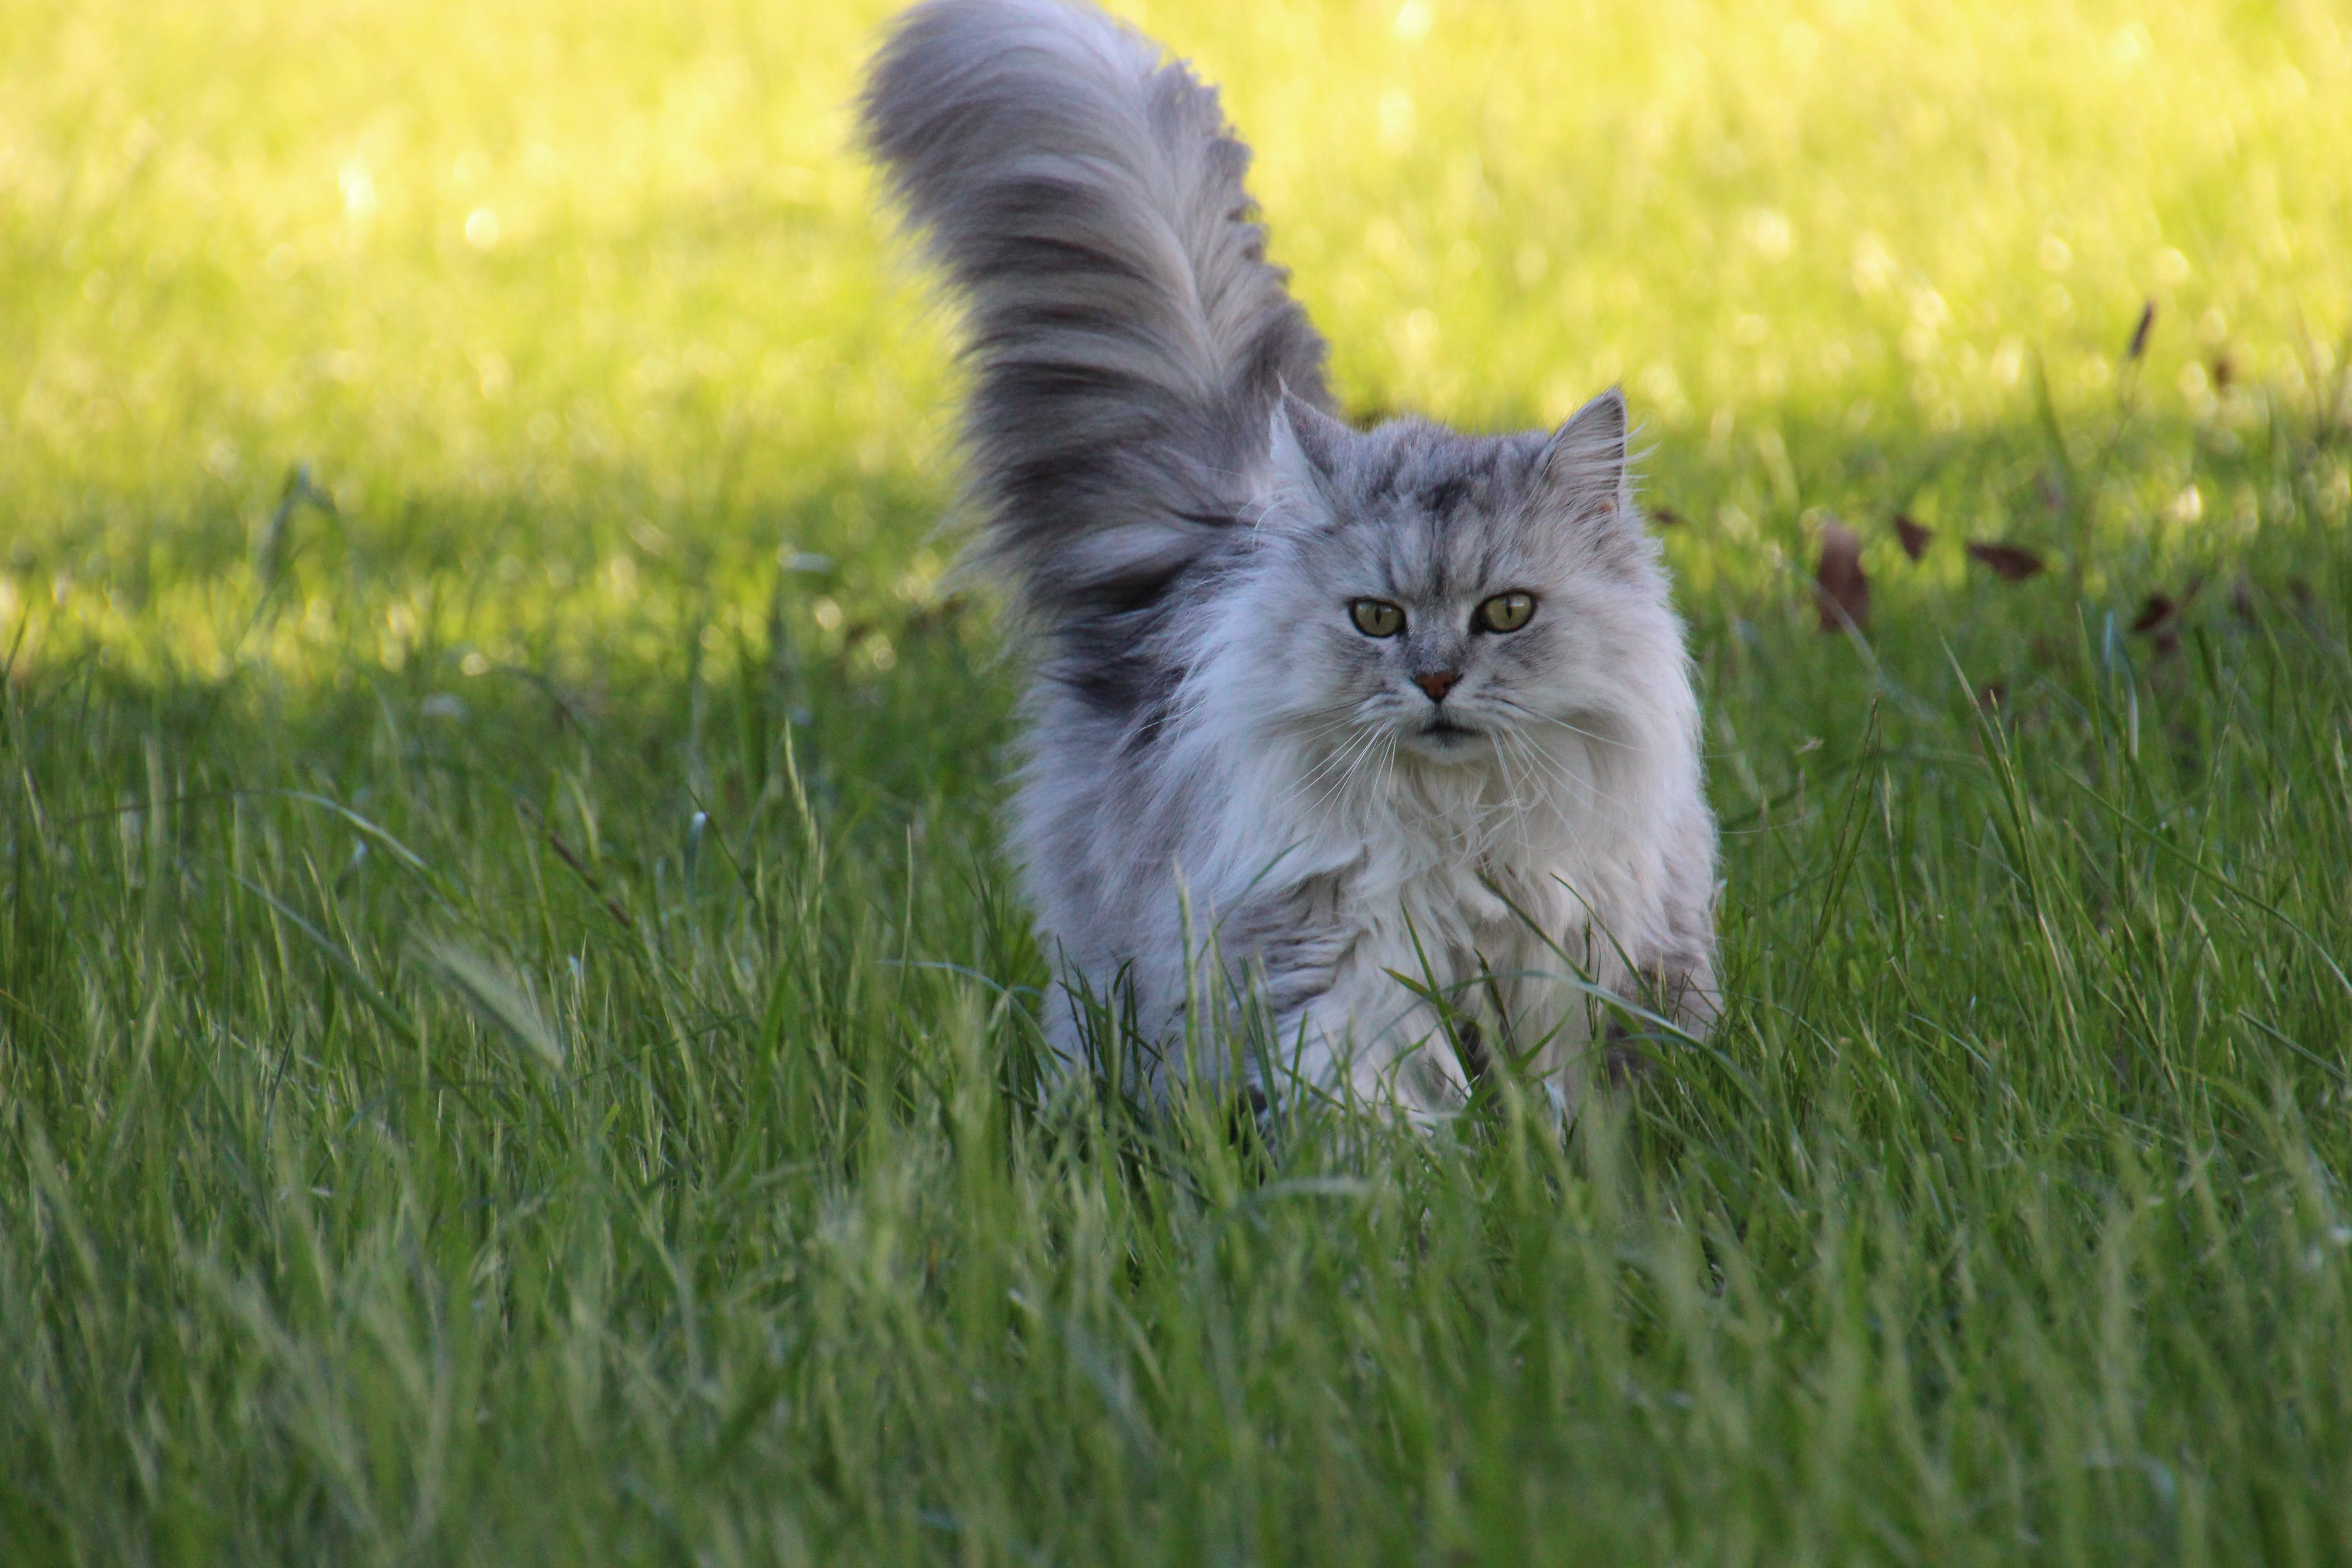 Asian Semi-longhair Cat on Grass